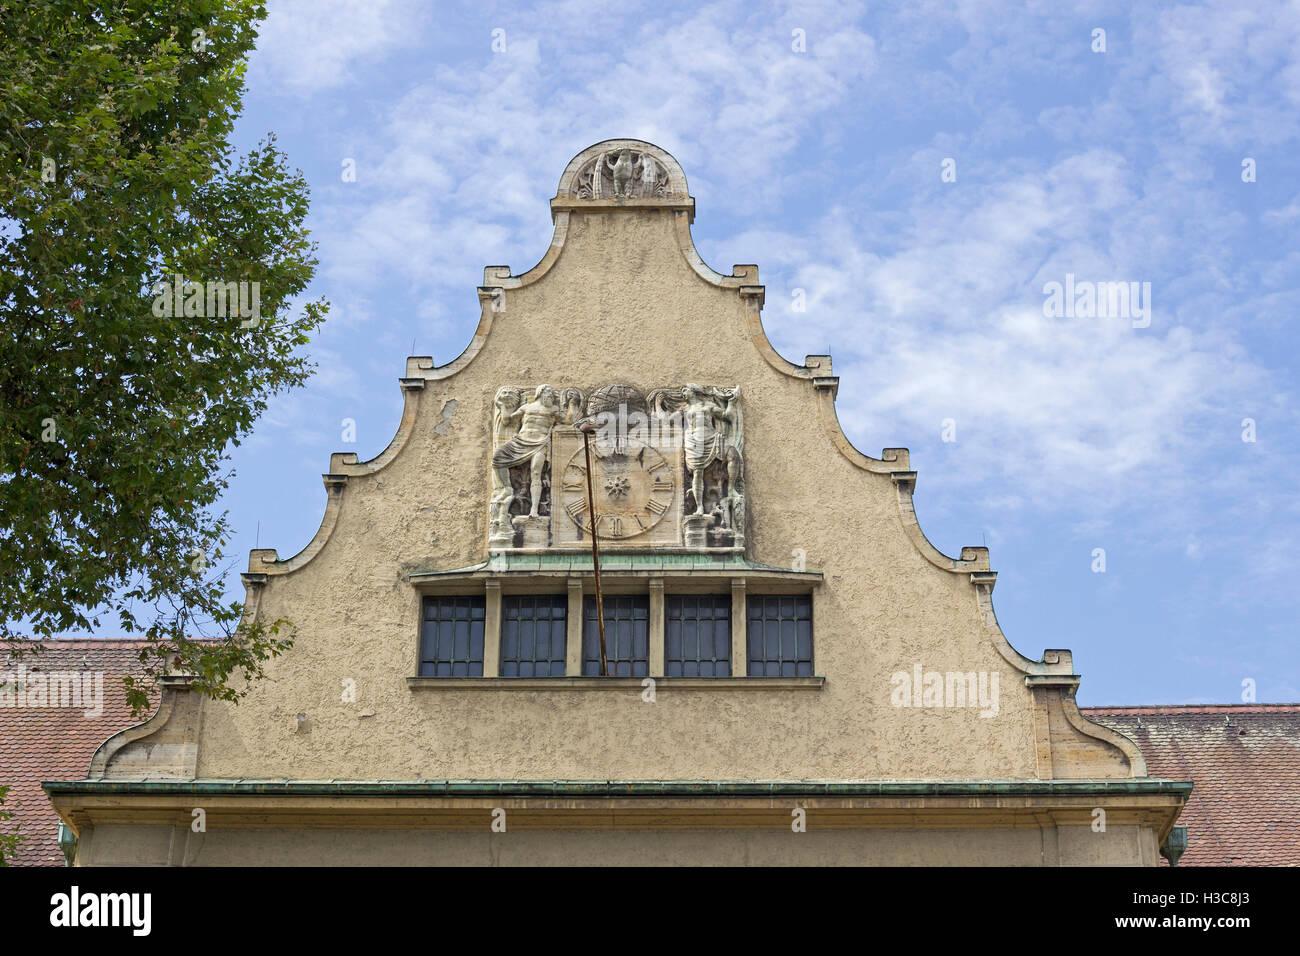 gable, train station, Lindau, Lake Constance, Bavaria, Germany - Stock Image